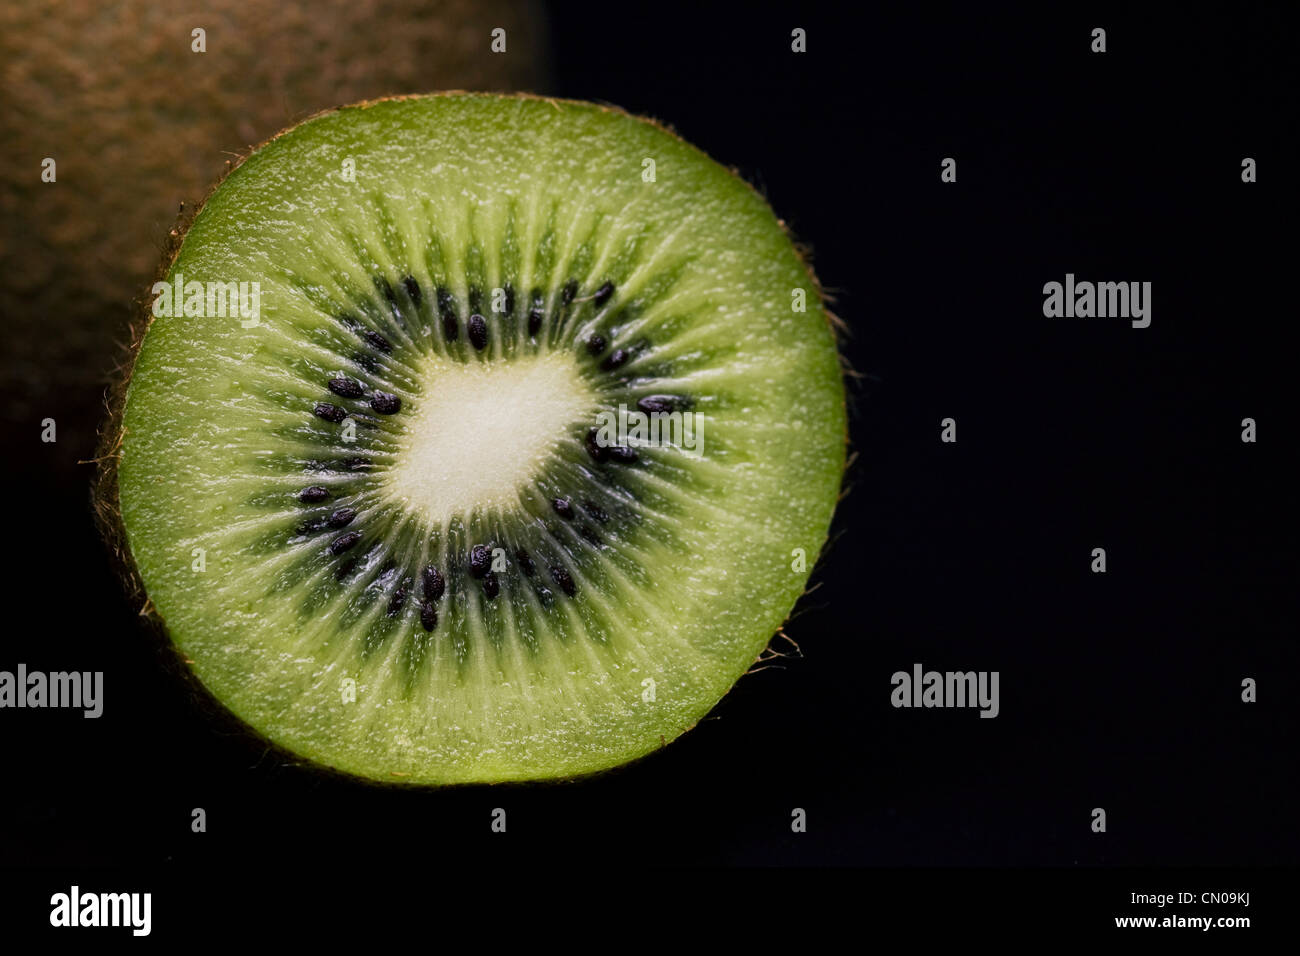 Actinidia deliciosa. Kiwi fruit cross section against a black background. - Stock Image